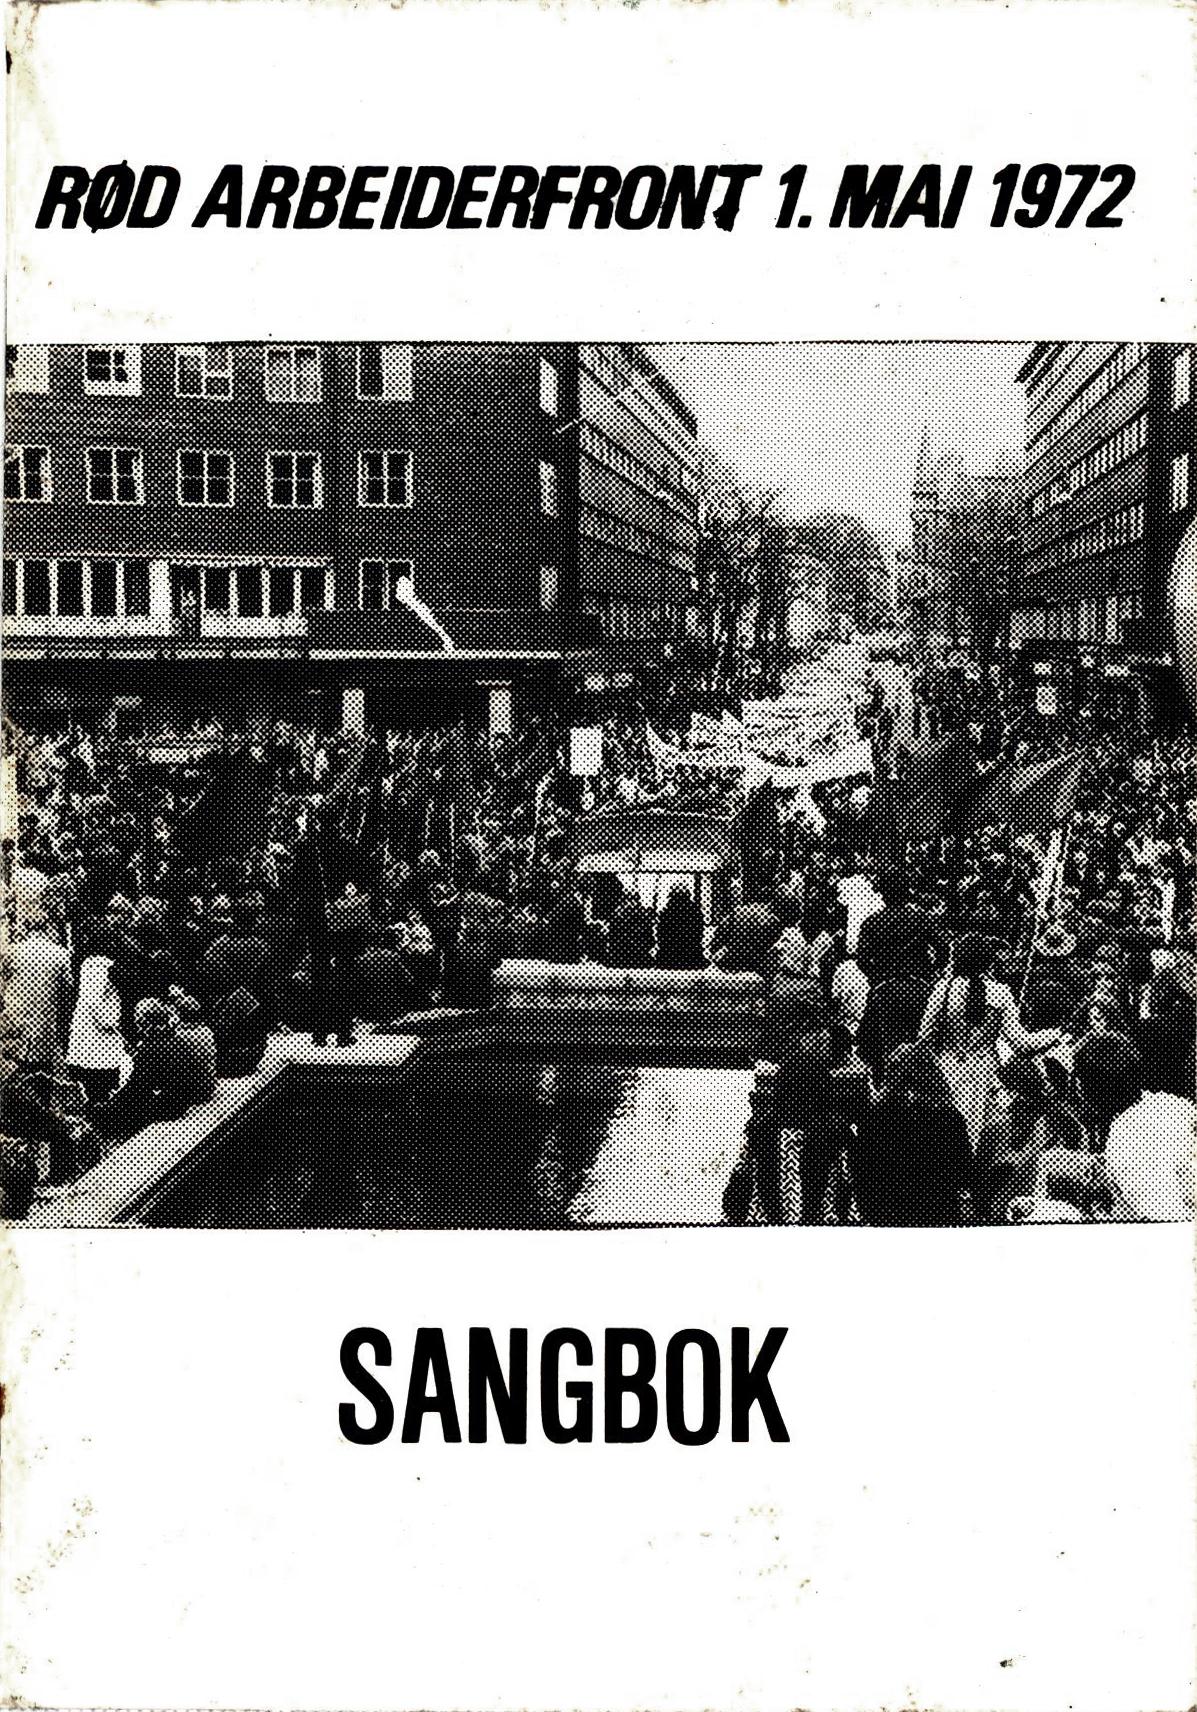 Sangbok - Rød arbeiderfront 1. mai 1972